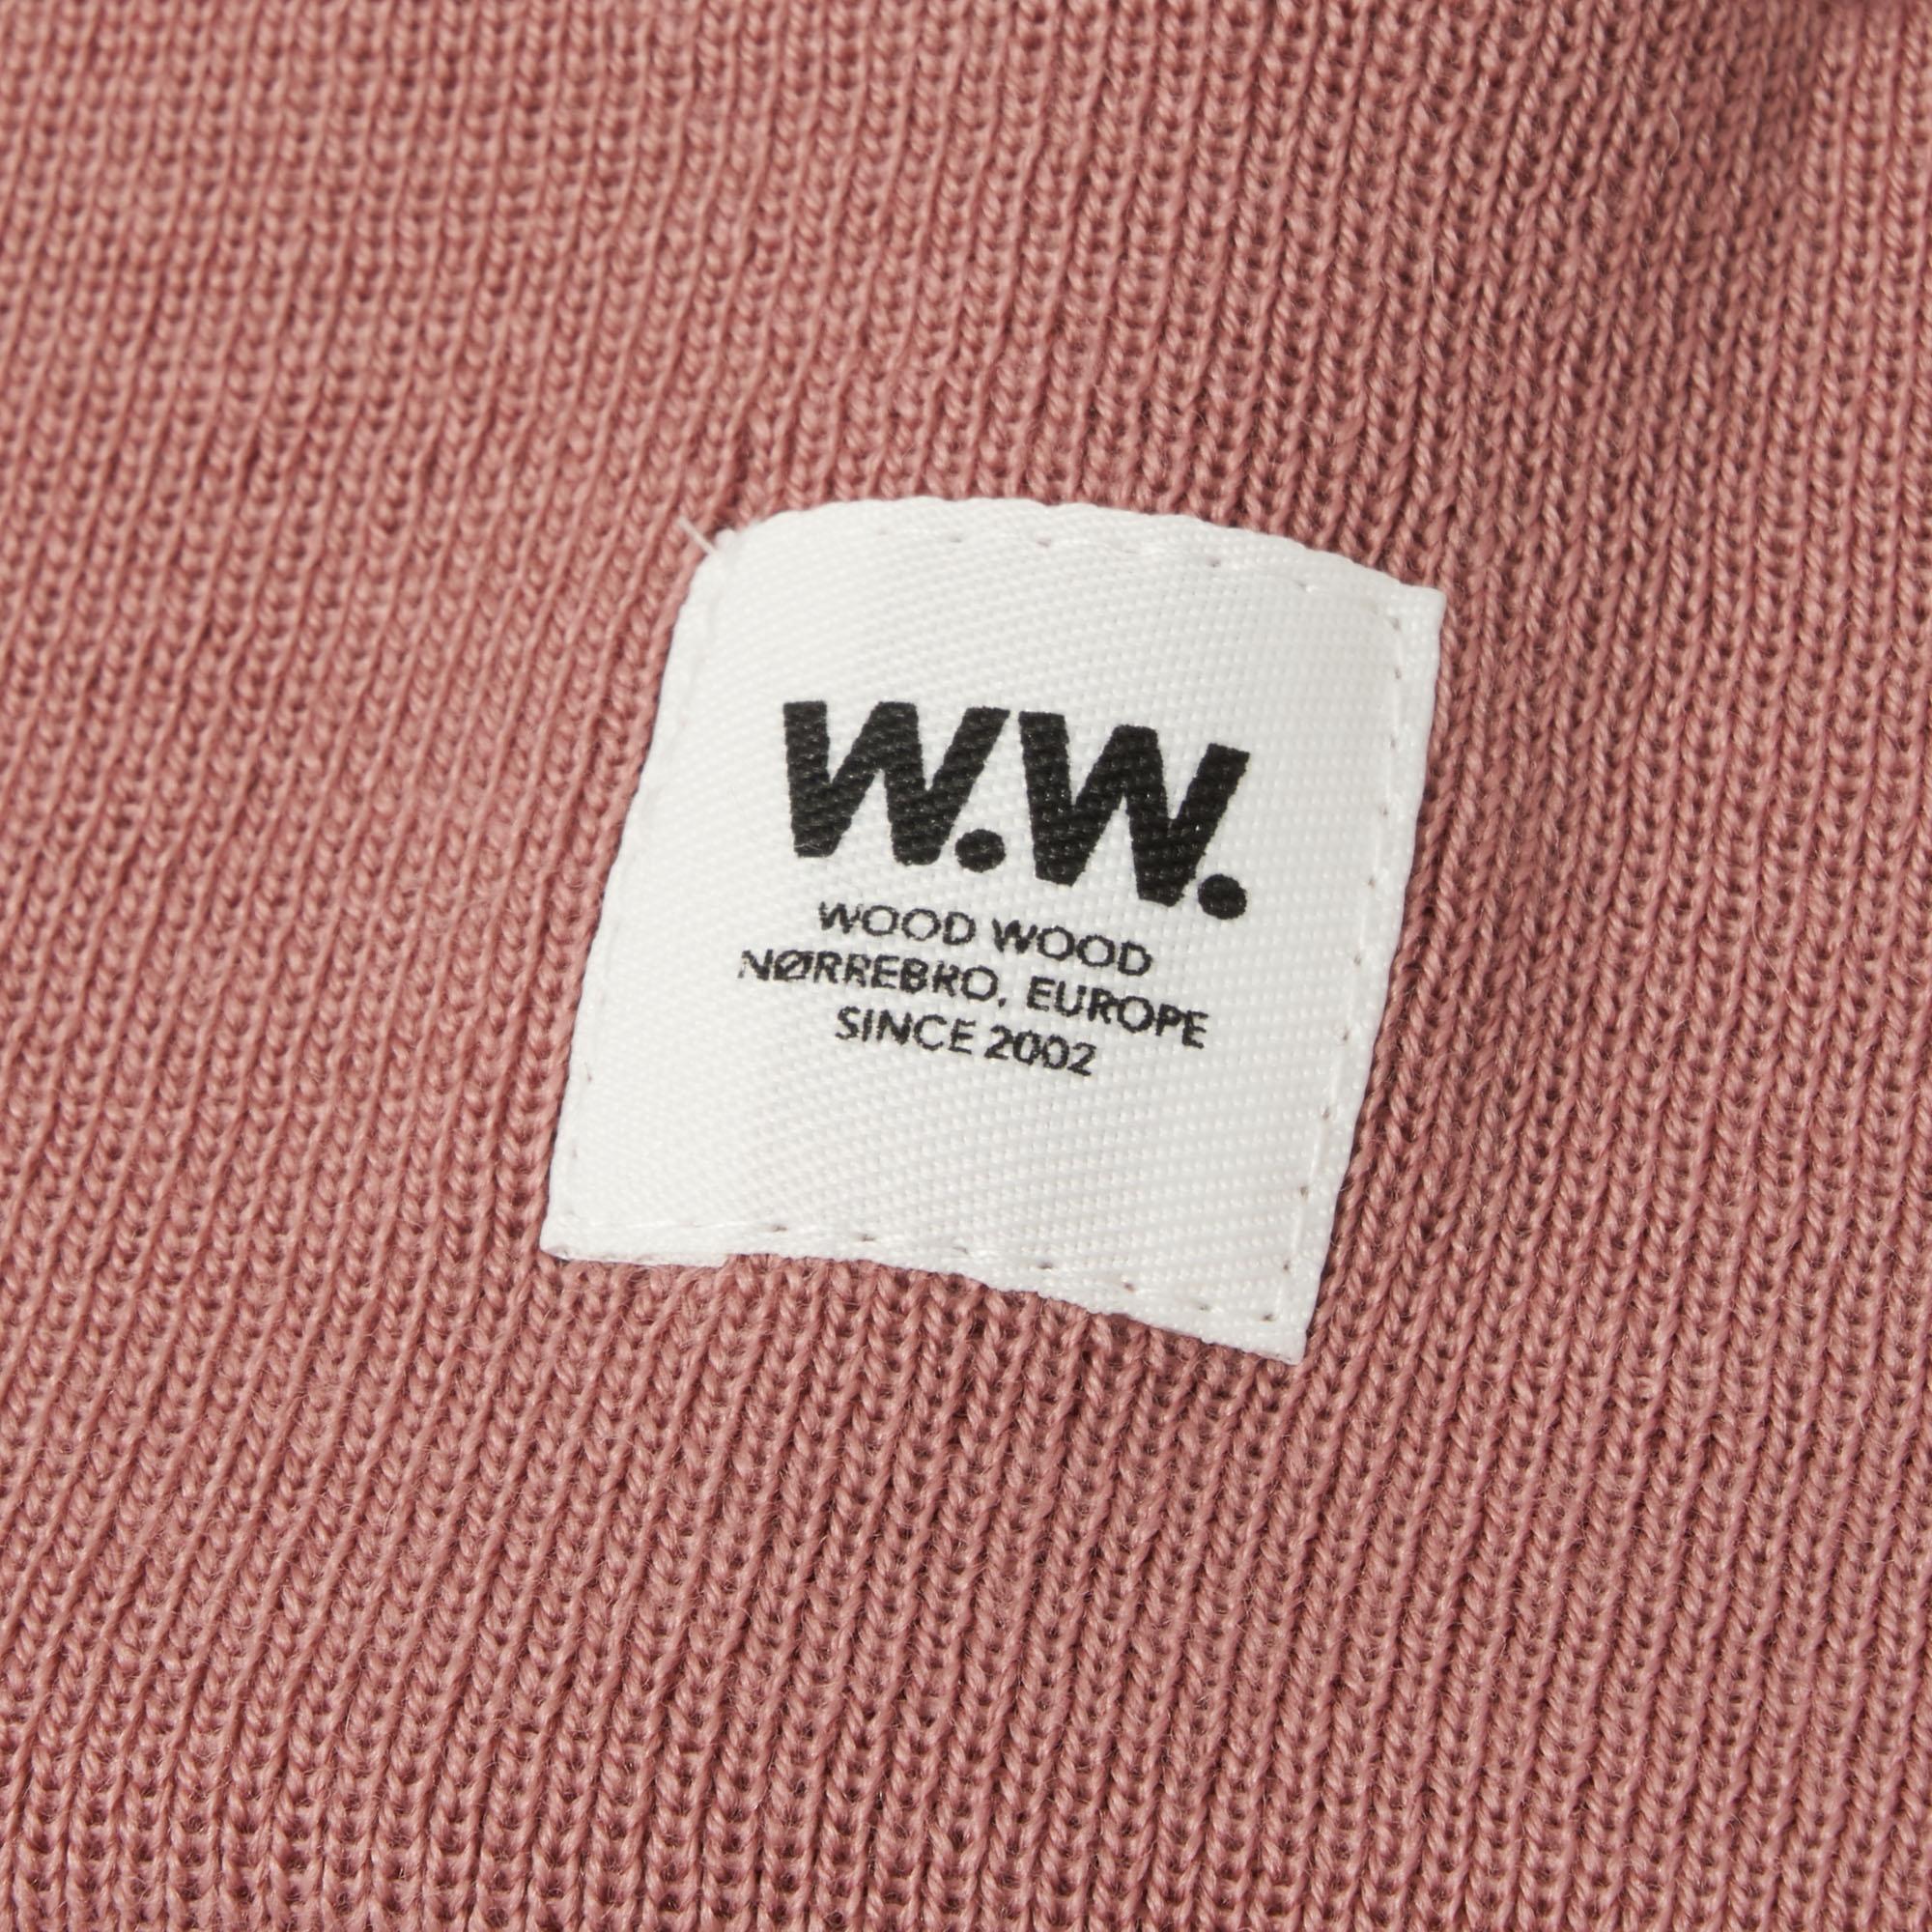 1561392b9ef Lyst - WOOD WOOD Gerald Tall Beanie - Dark Rose in Pink for Men